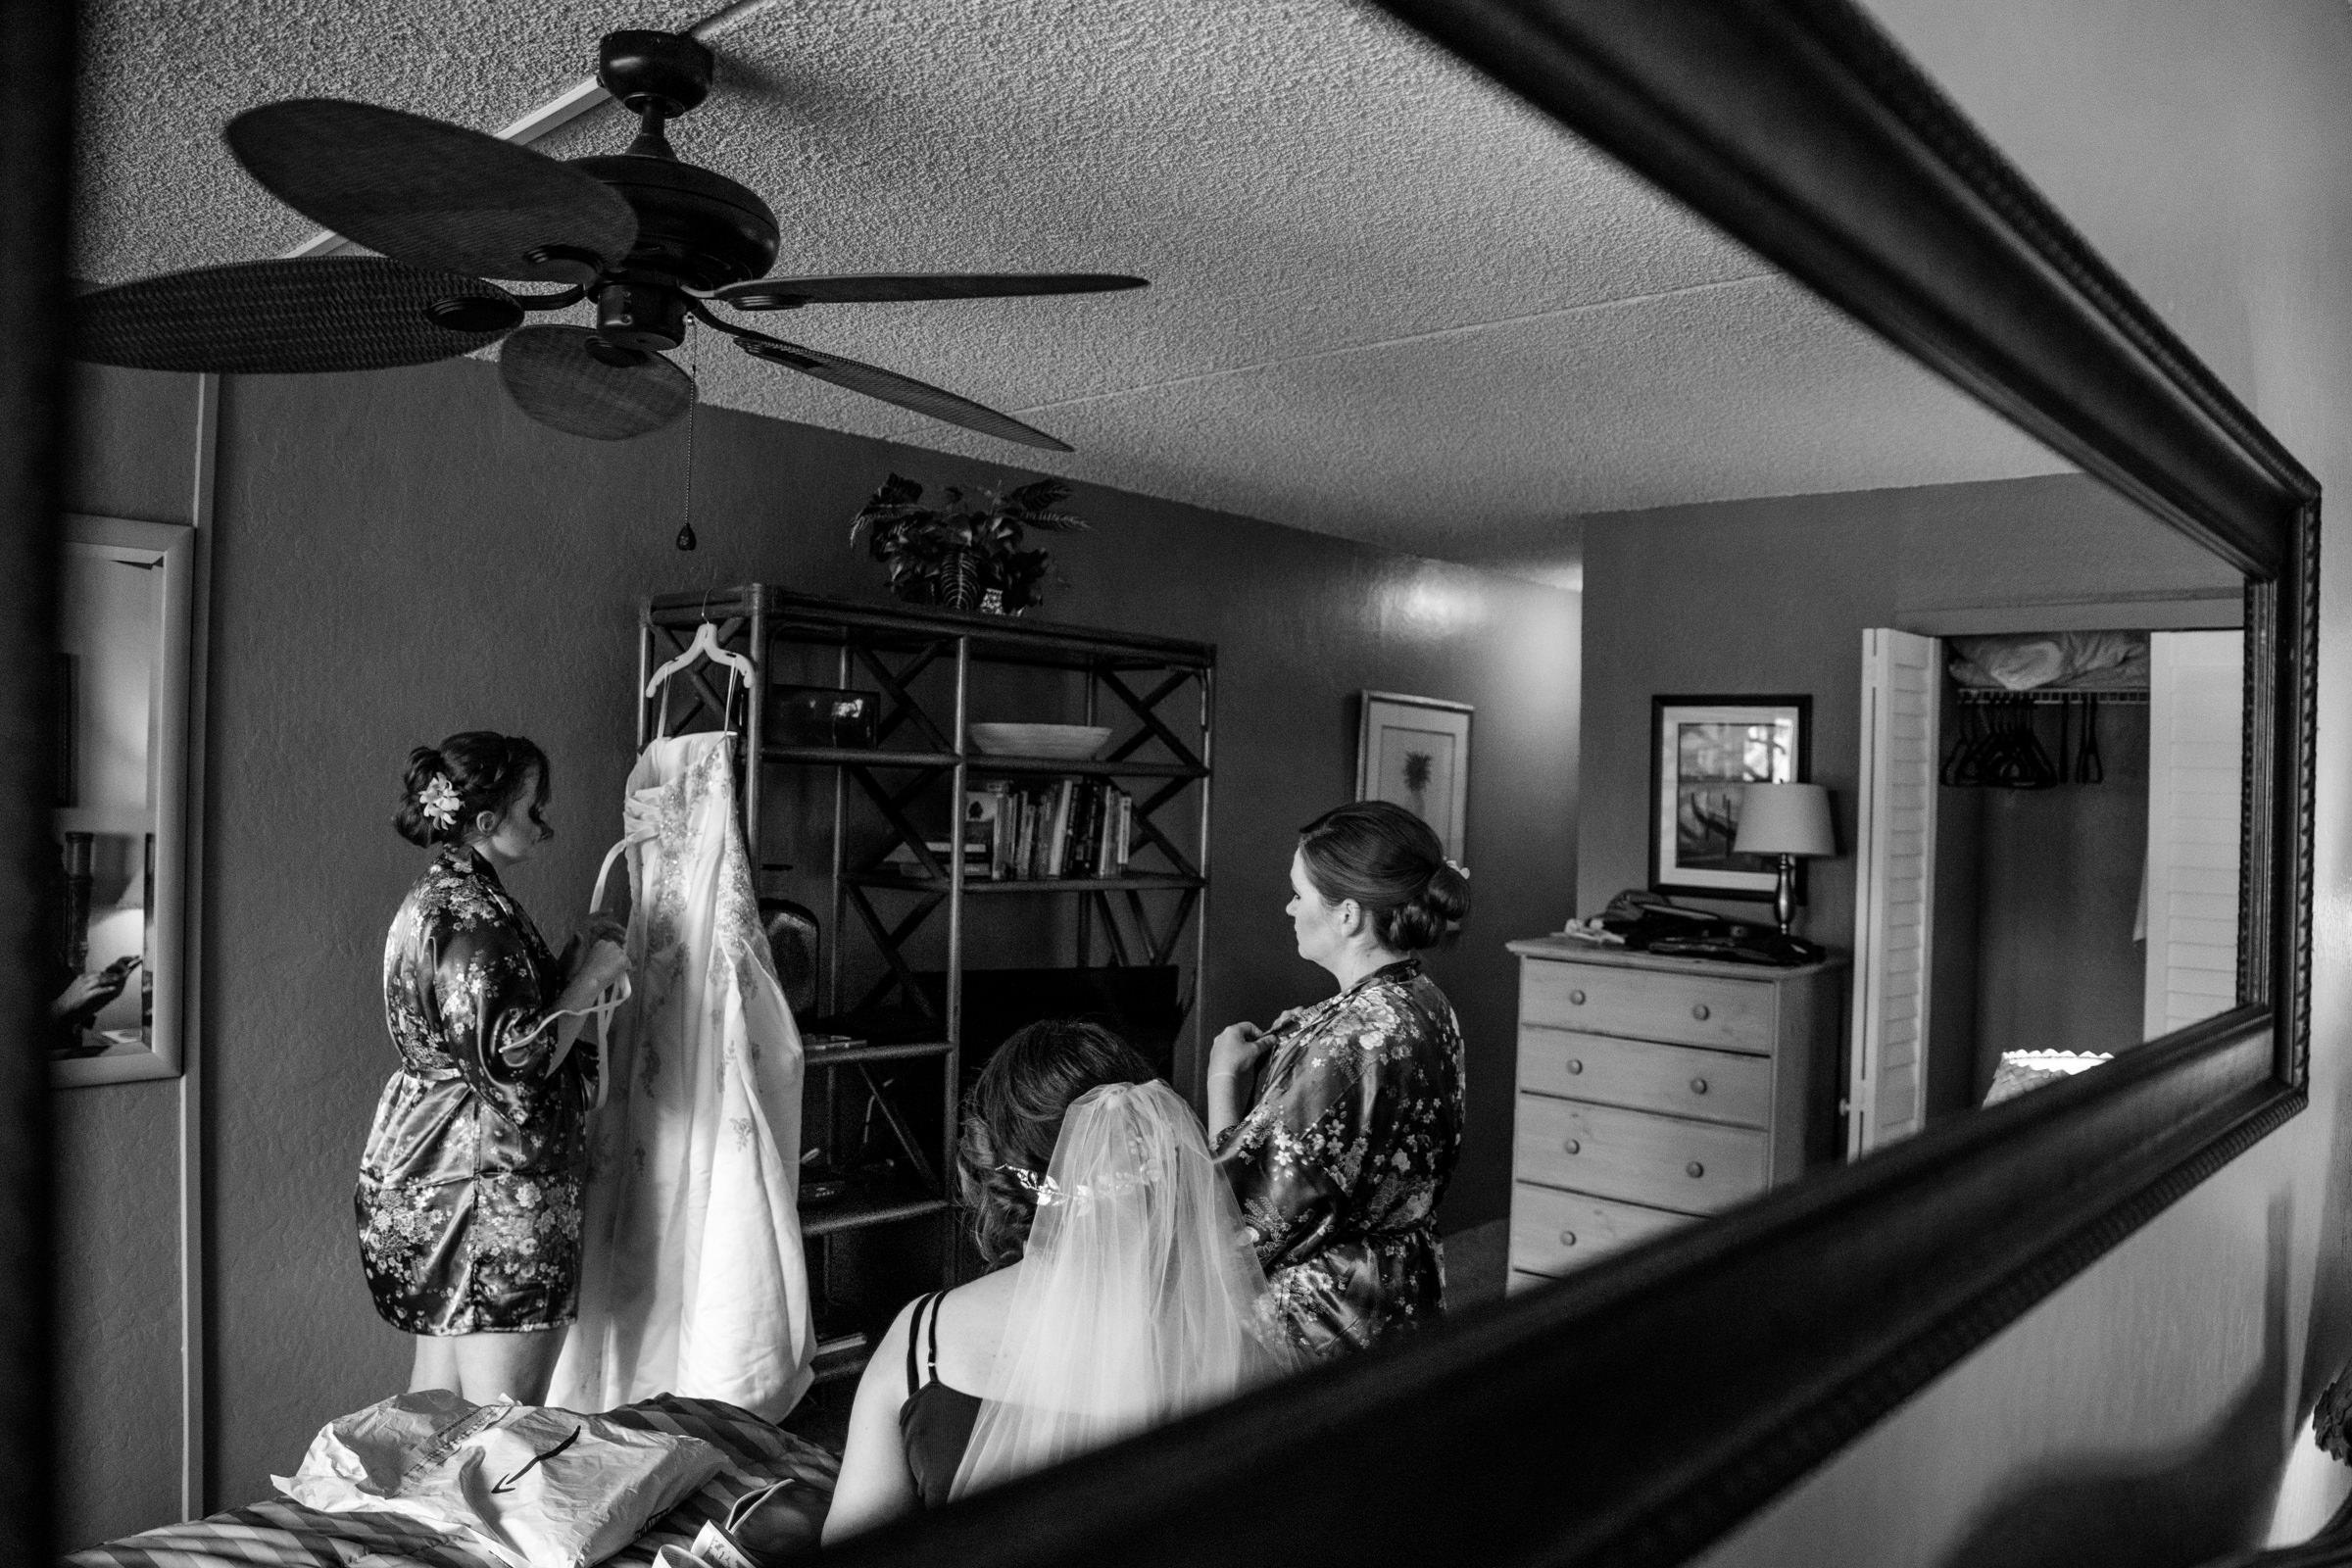 wedding-photographer-photography-destination-hawaii-lake-tahoe-getting-ready-wedding-dress